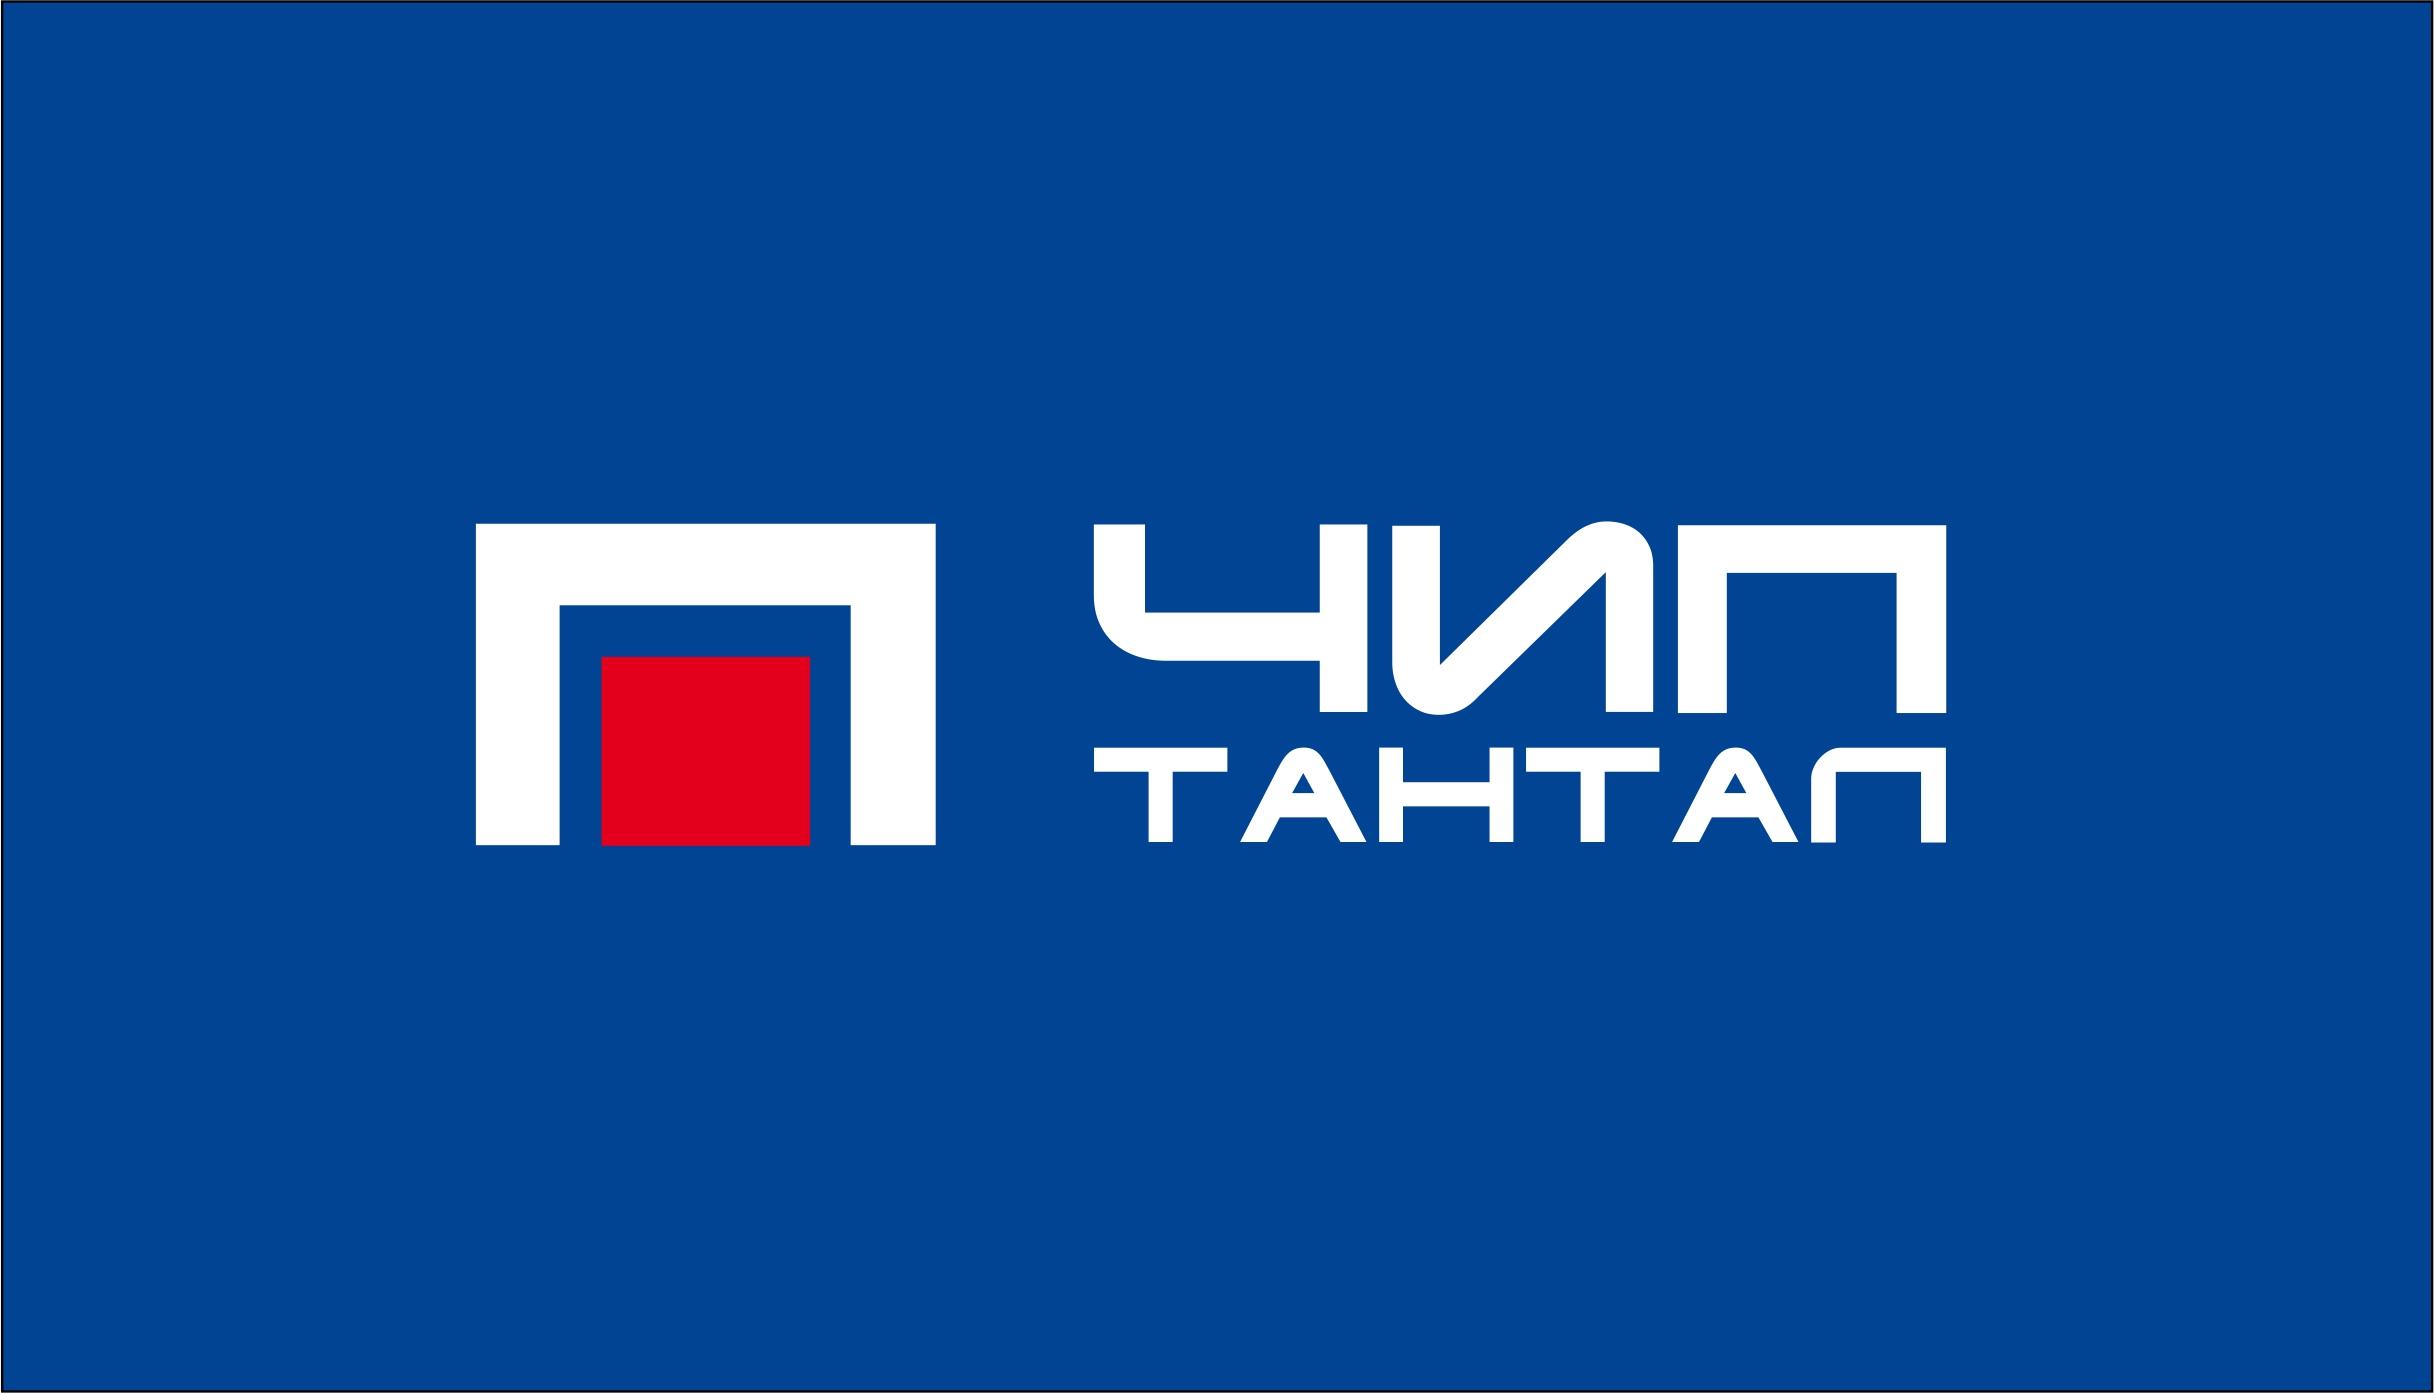 Логотип + Дизайн настольного календаря фото f_7975a2aefba1b084.jpg